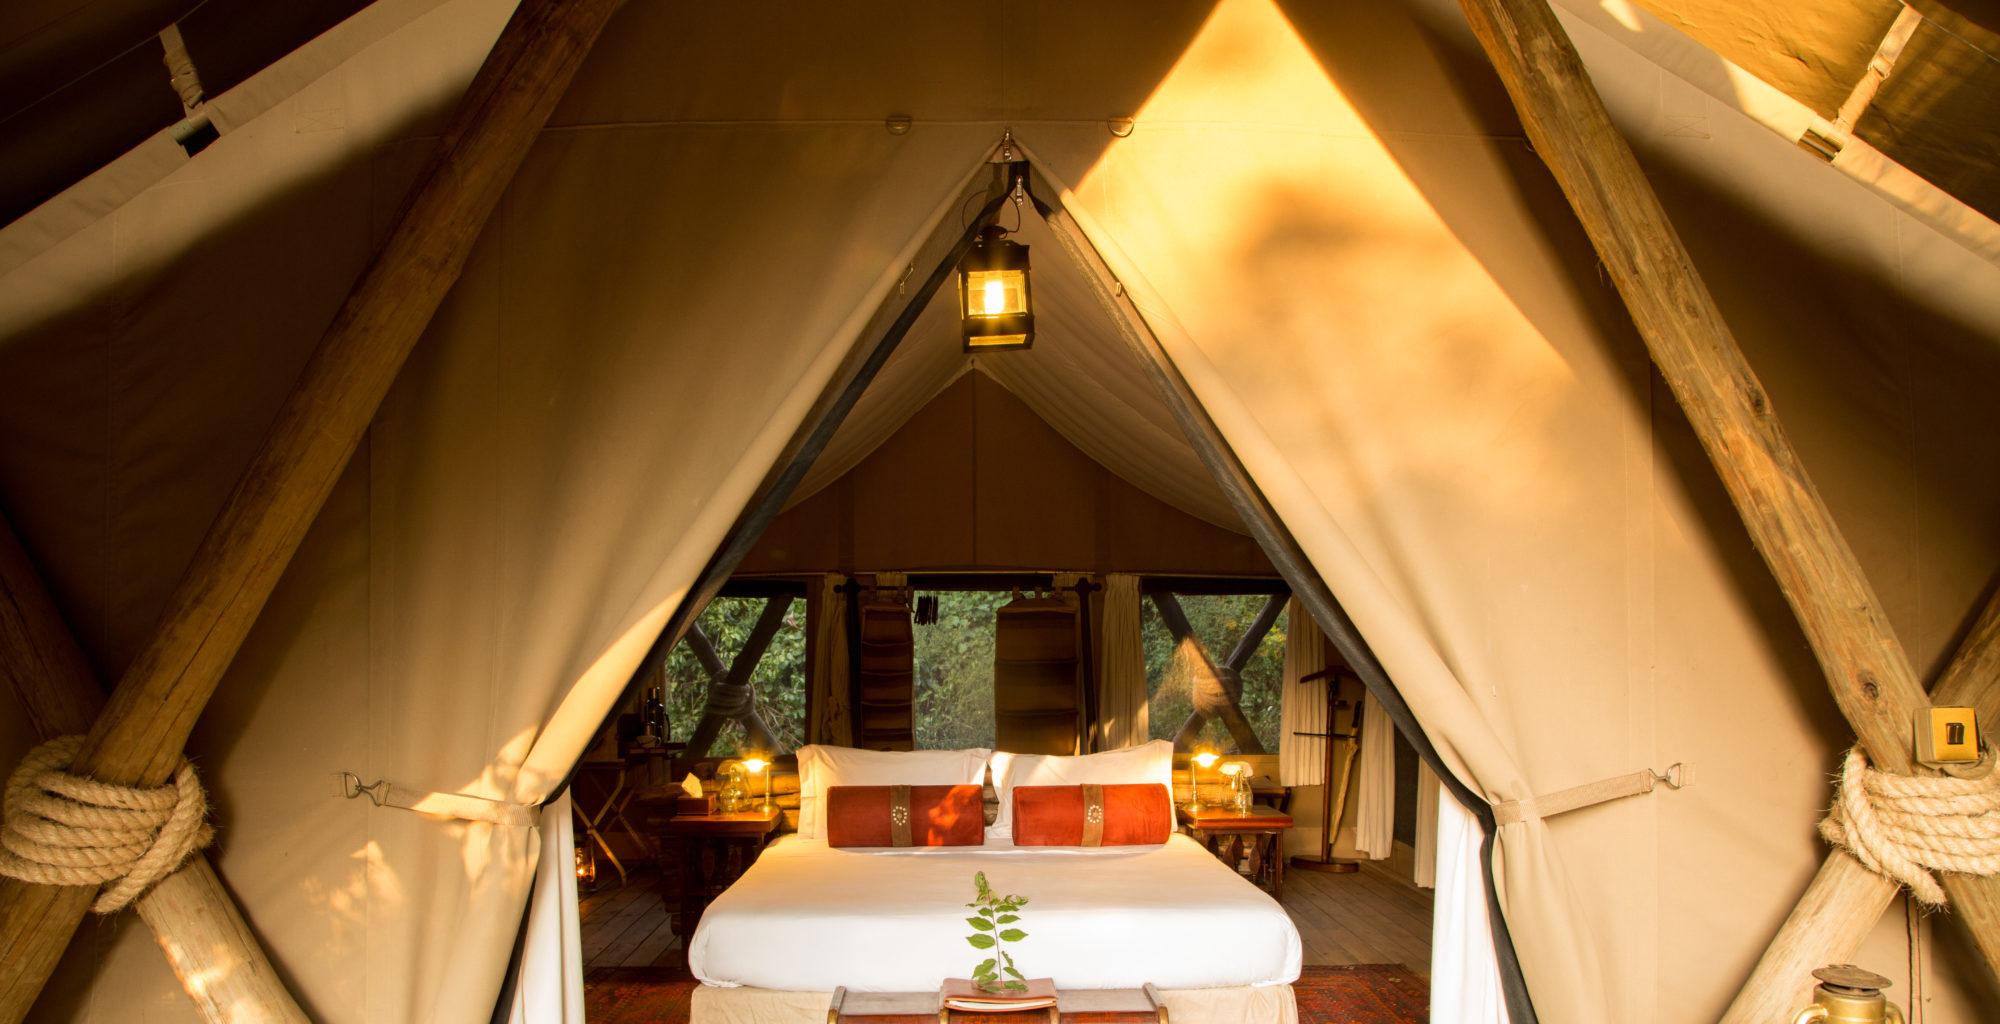 Mara Expedition Camp Bedroom Kenya